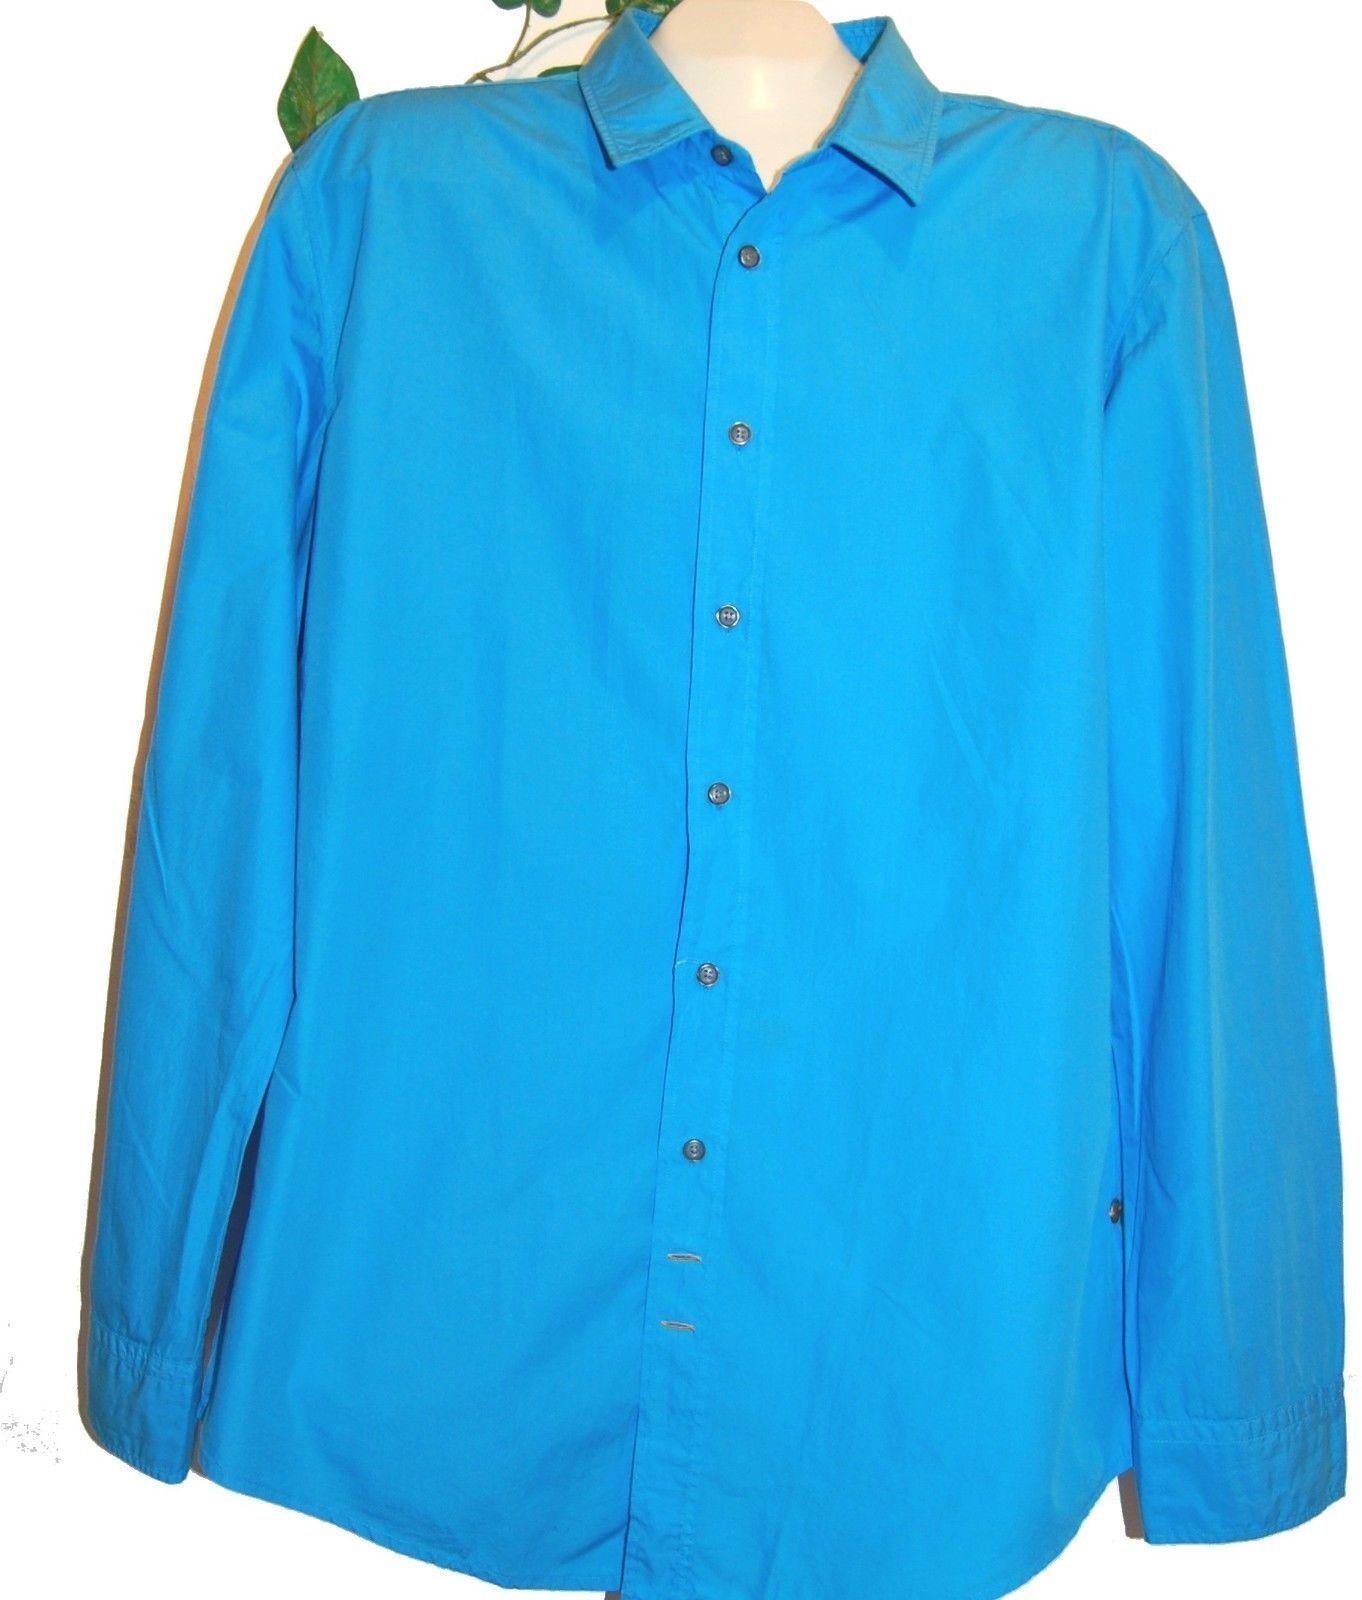 orange Hugo by Boss Men's bluee Cotton Dress Casual Button Front Shirt Sz 2XL